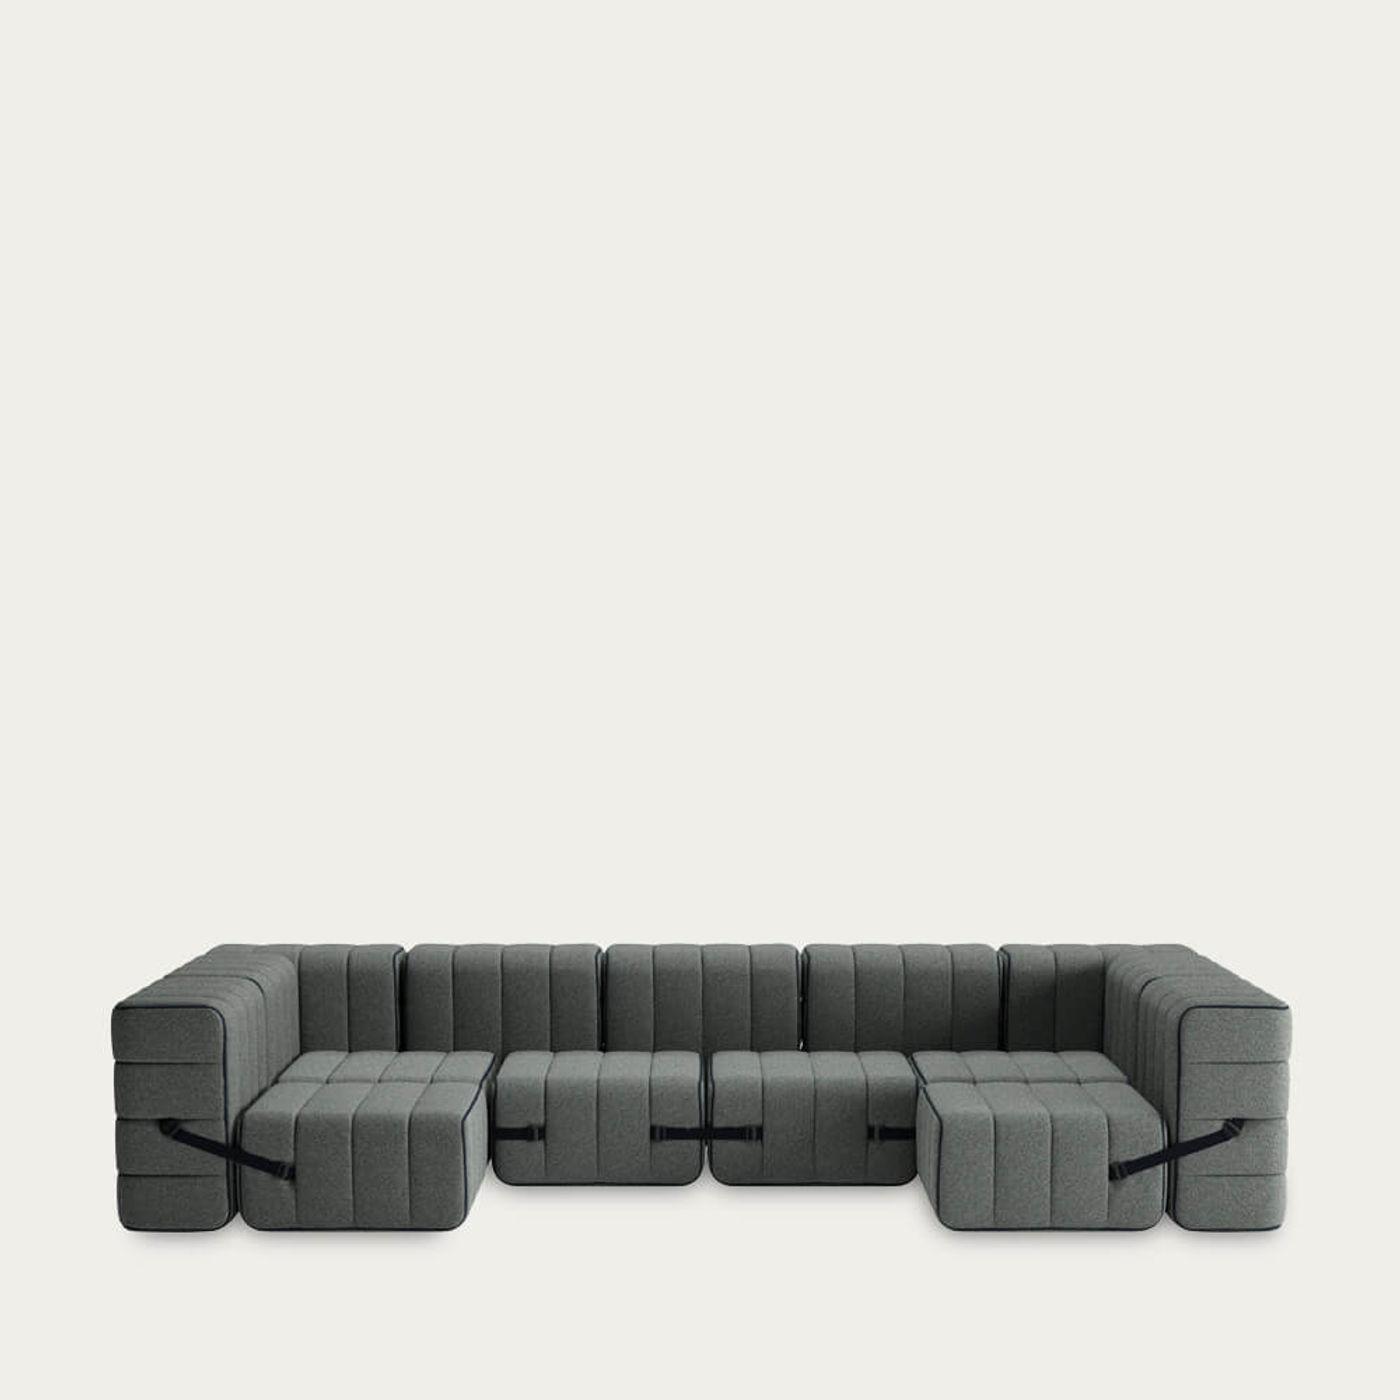 Grey Curt Sofa System 15 Modules - Sera | Bombinate